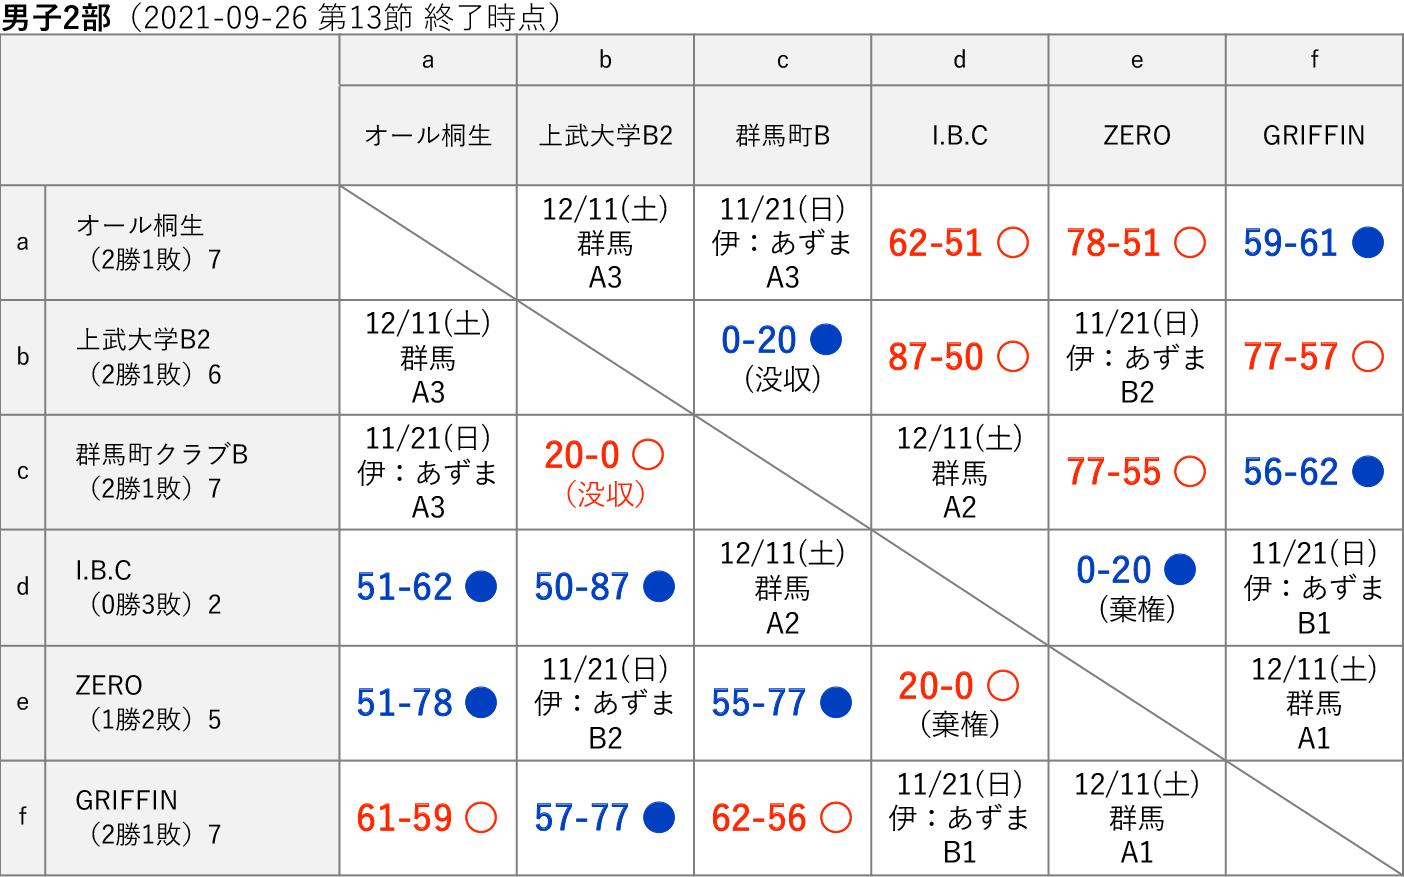 2021社会人リーグ 男子2部 星取り表(2021-09-26 第13節終了時)